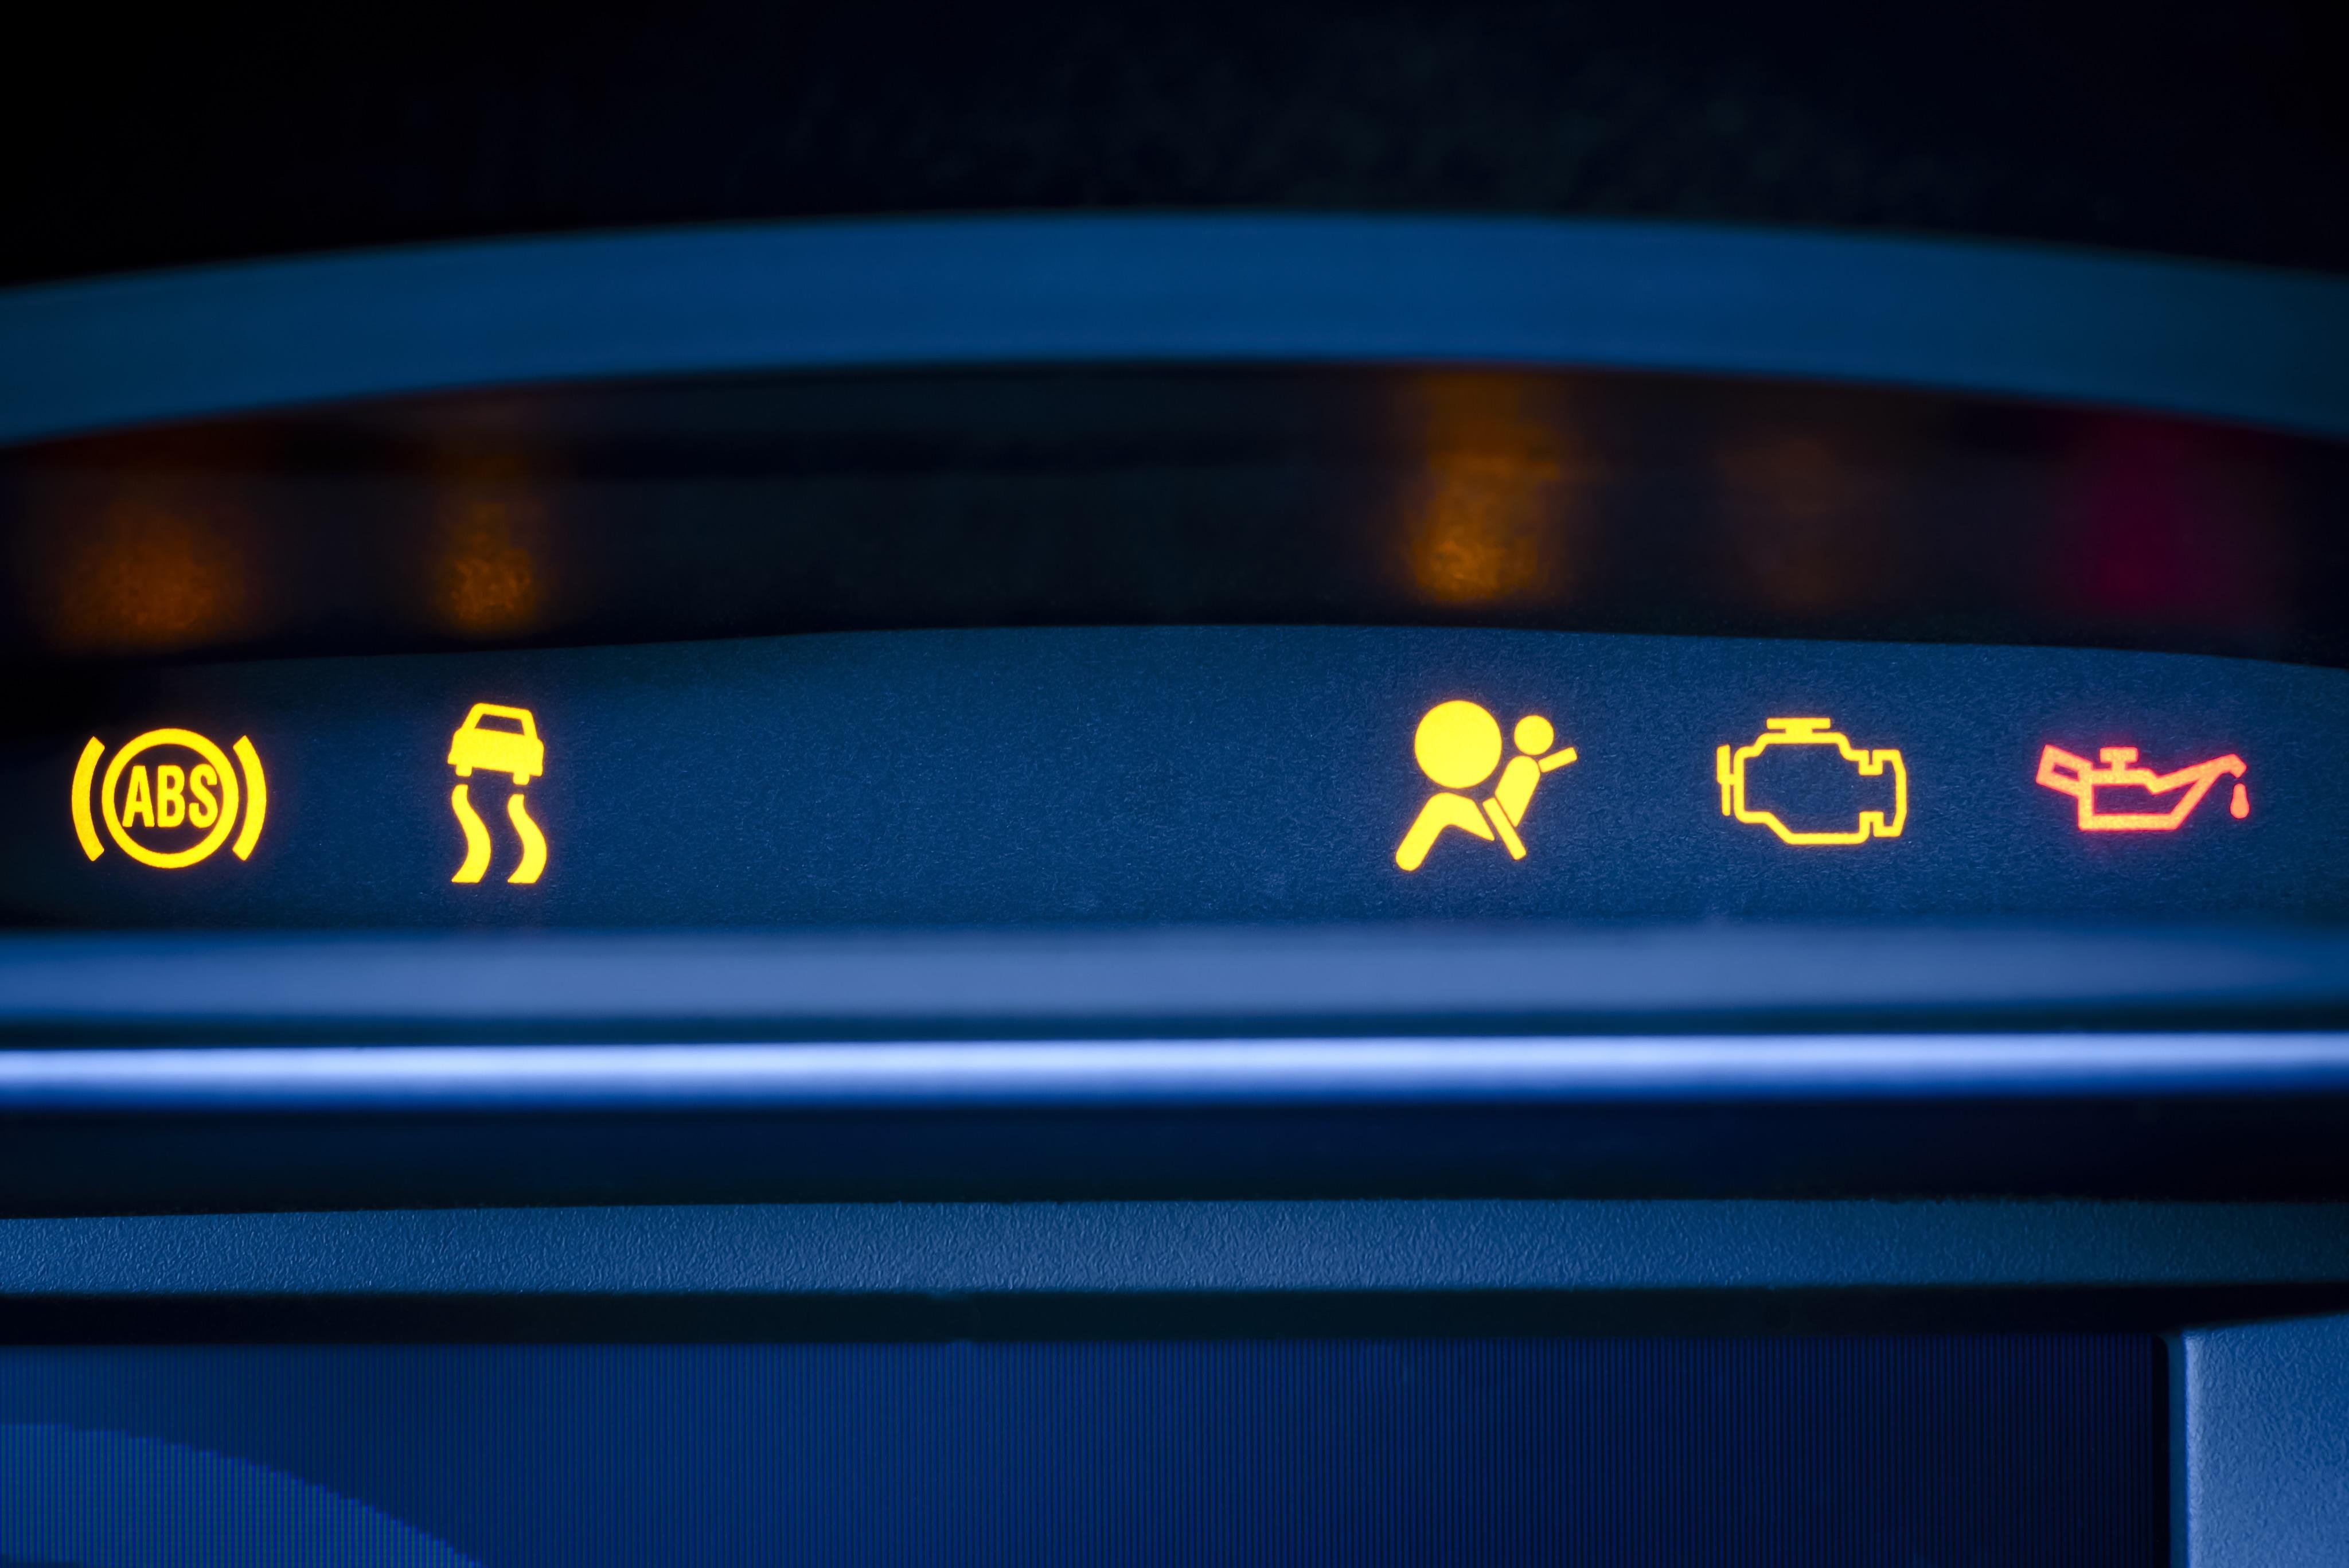 Hyundai Ioniq Dashboard Symbols St Peters Mo St Charles Hyundai